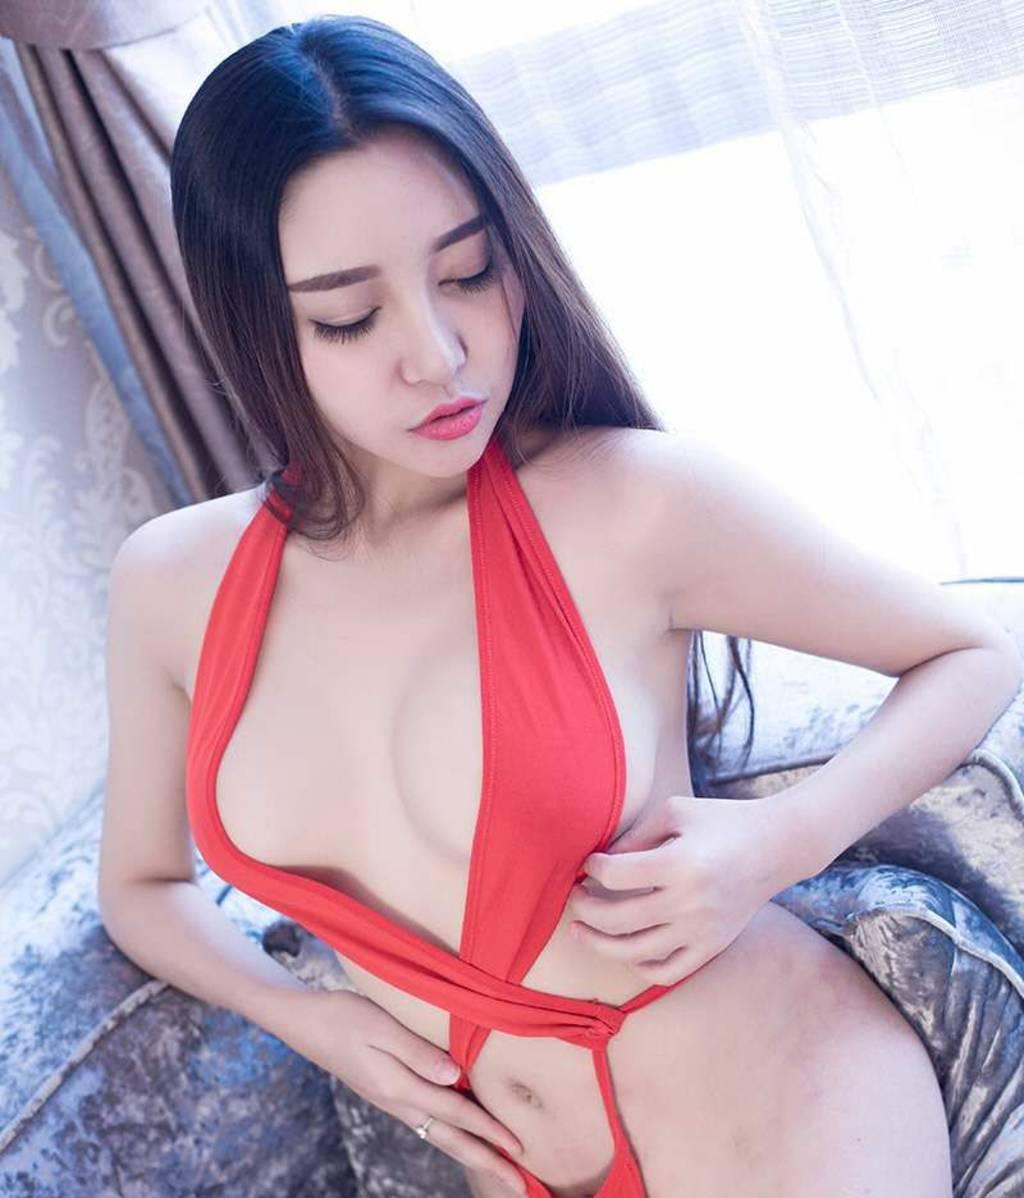 Brampton $7O/hh416~816~8615NEW ASIAN G!RLALL MENUS